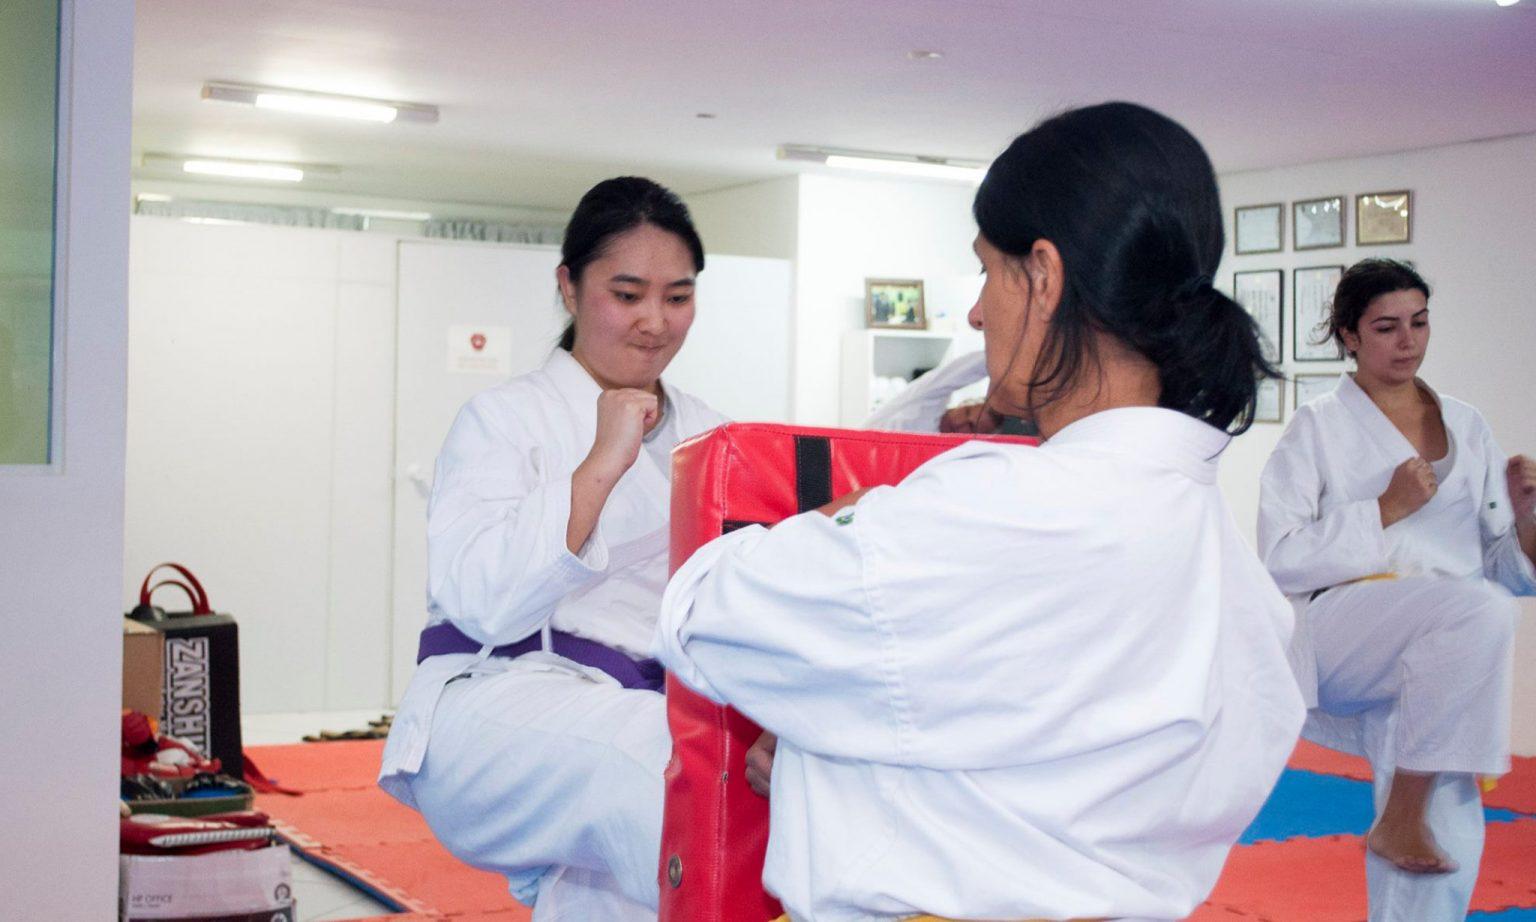 karate 0003 mulheres Shinjigenkan Brasil